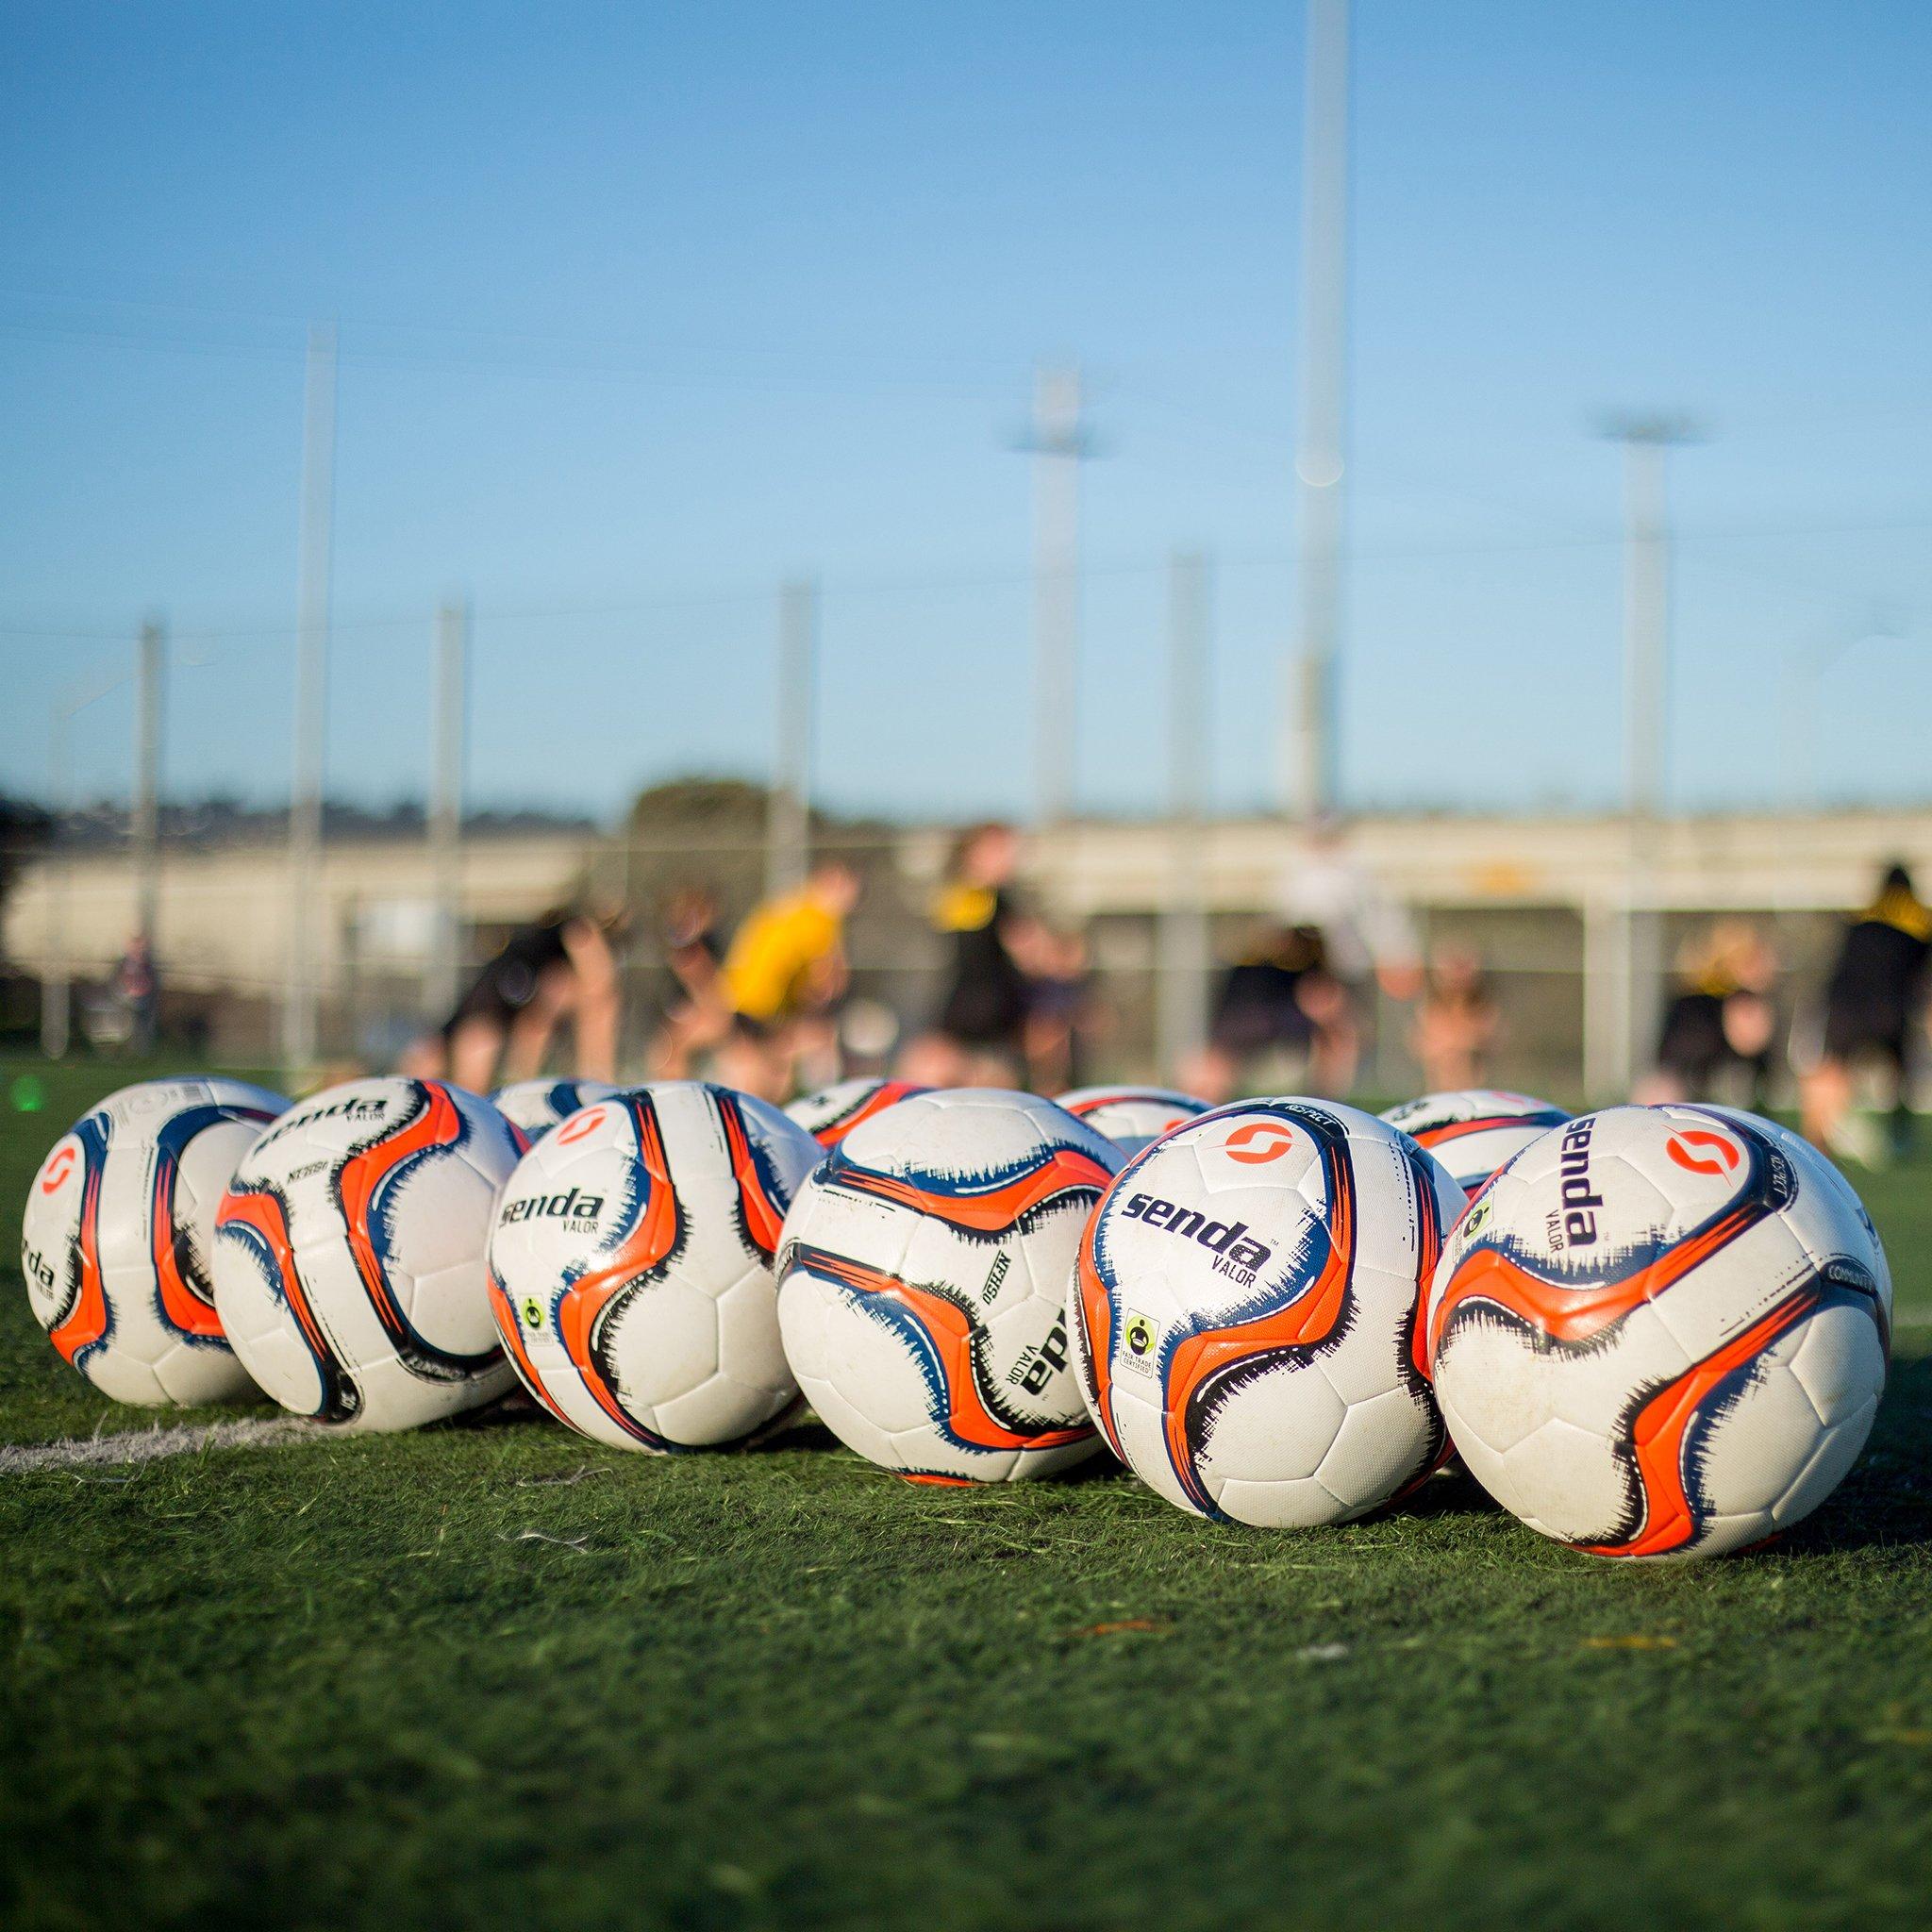 Senda Valor Match Soccer Ball, Fair Trade Certified, Orange/Navy Blue, Size 5 (Ages 13 & Up) by S Senda (Image #3)